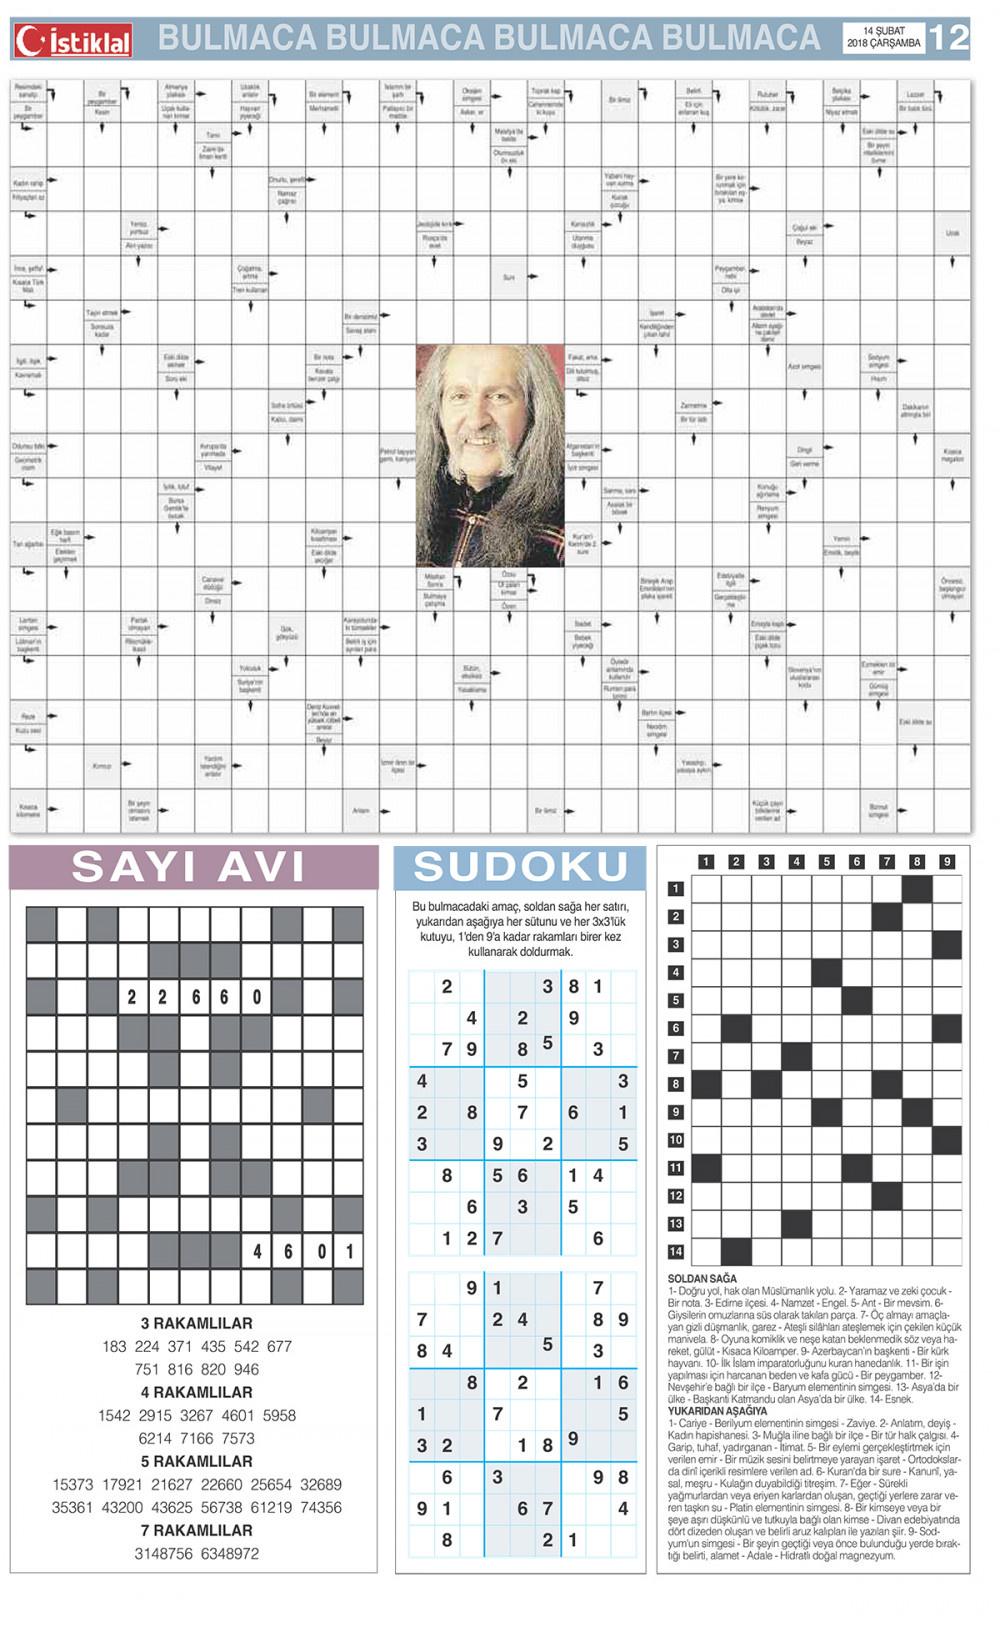 İstiklal Gazetesi 12'nci Sayfa